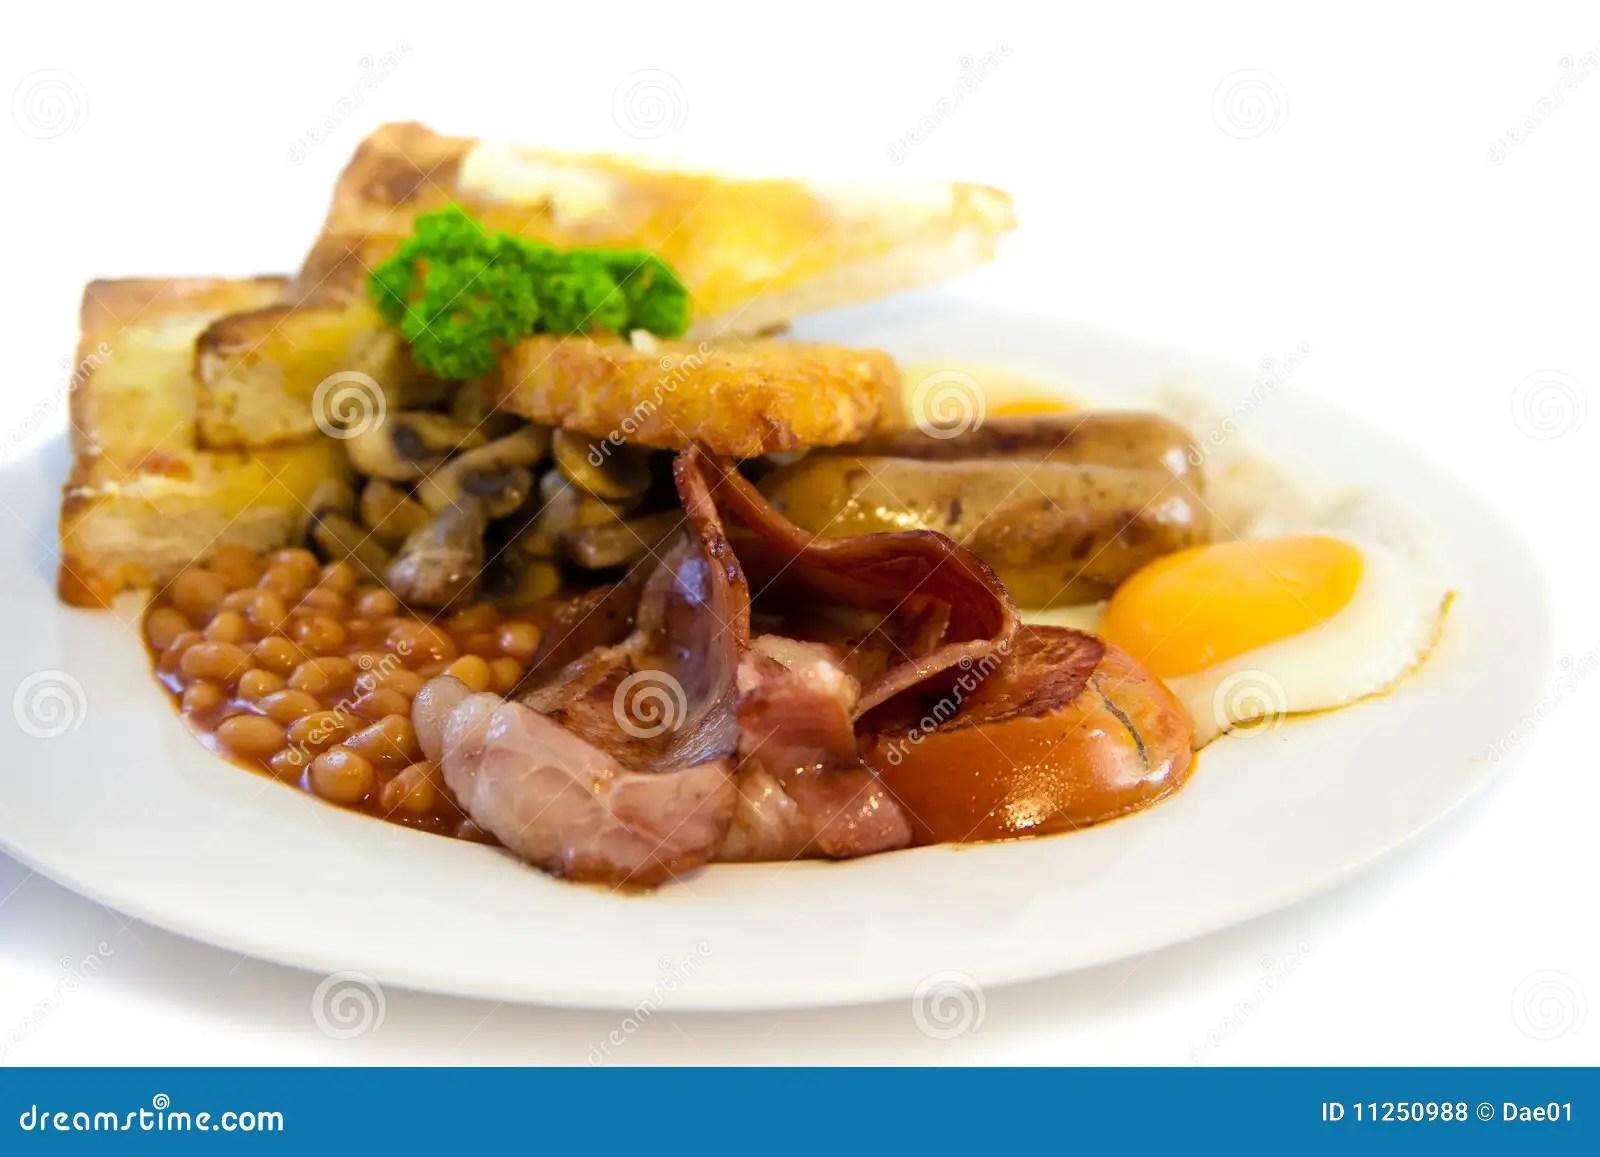 Full australian breakfast stock photo. Image of whole - 11250988